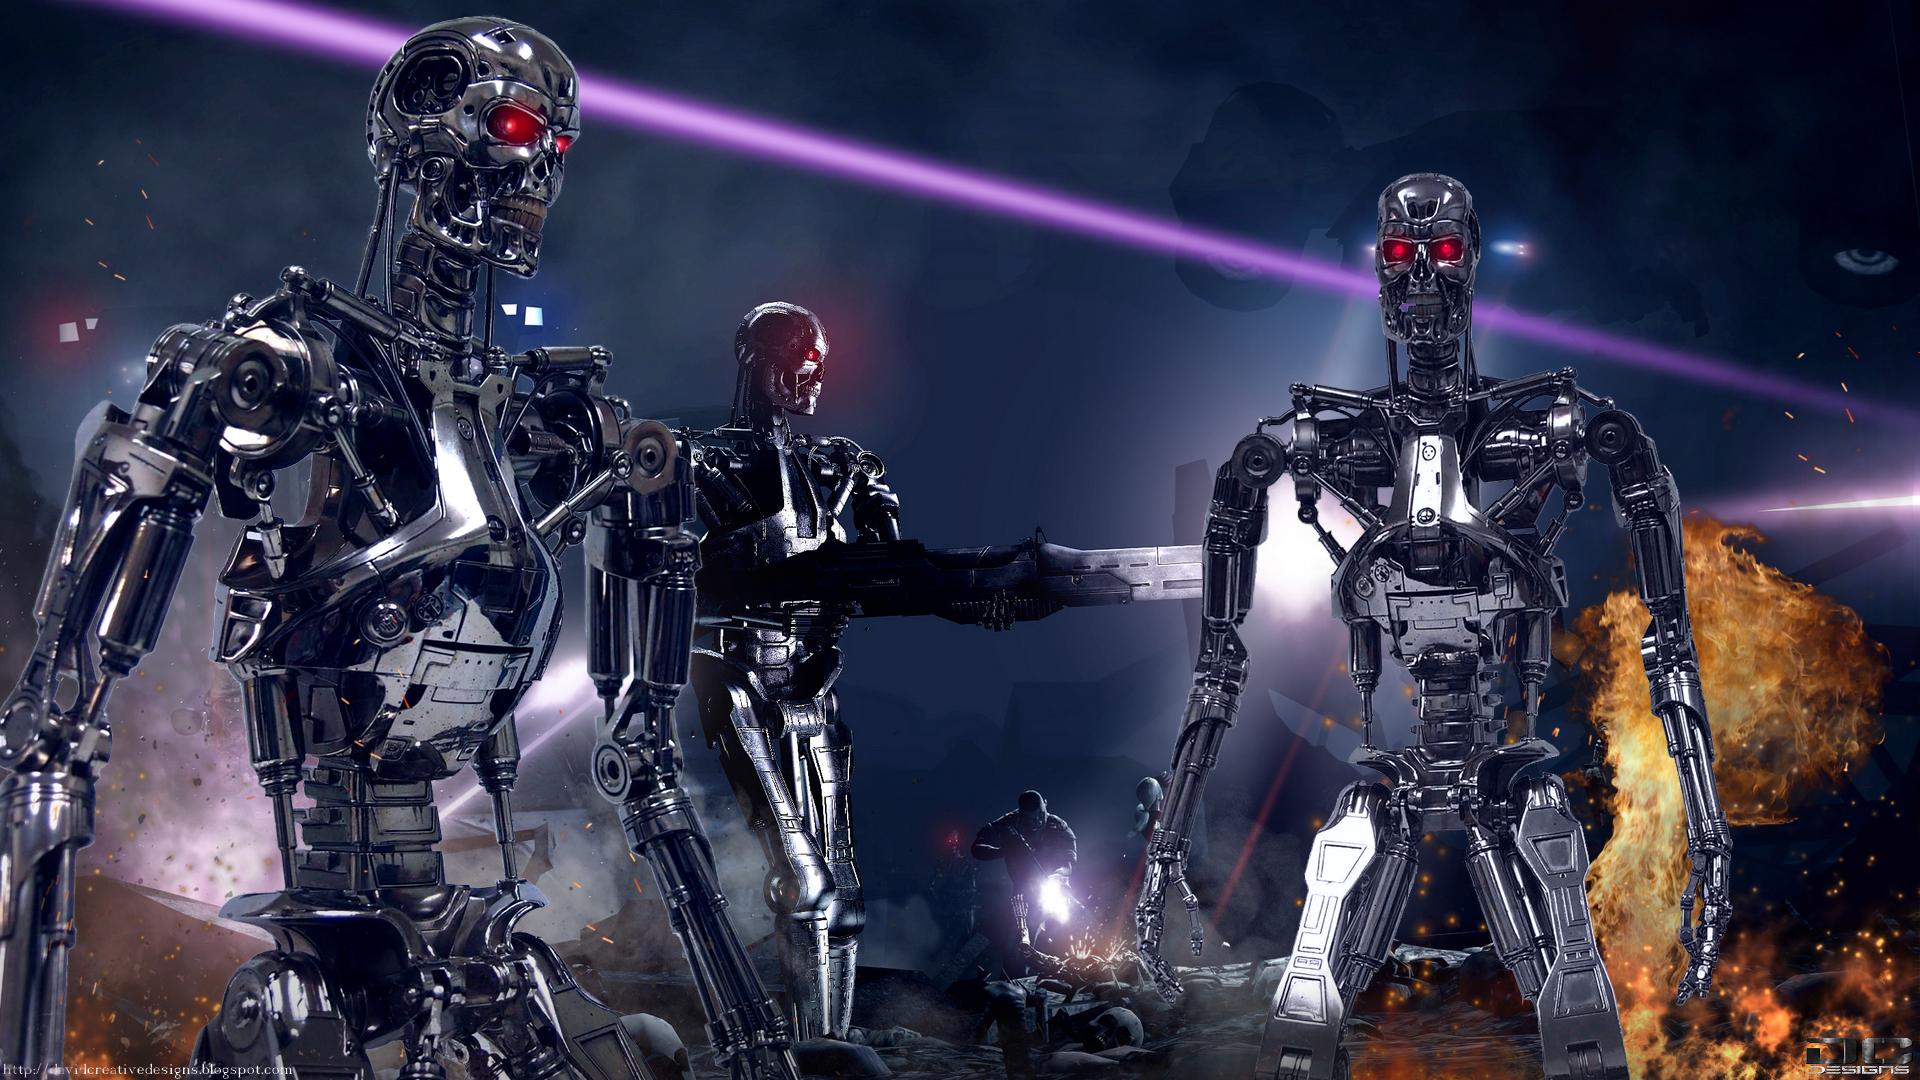 Los angeles 2029 hd wallpaper background image 1920x1080 id 568993 wallpaper abyss - Terminator 2 wallpaper hd ...